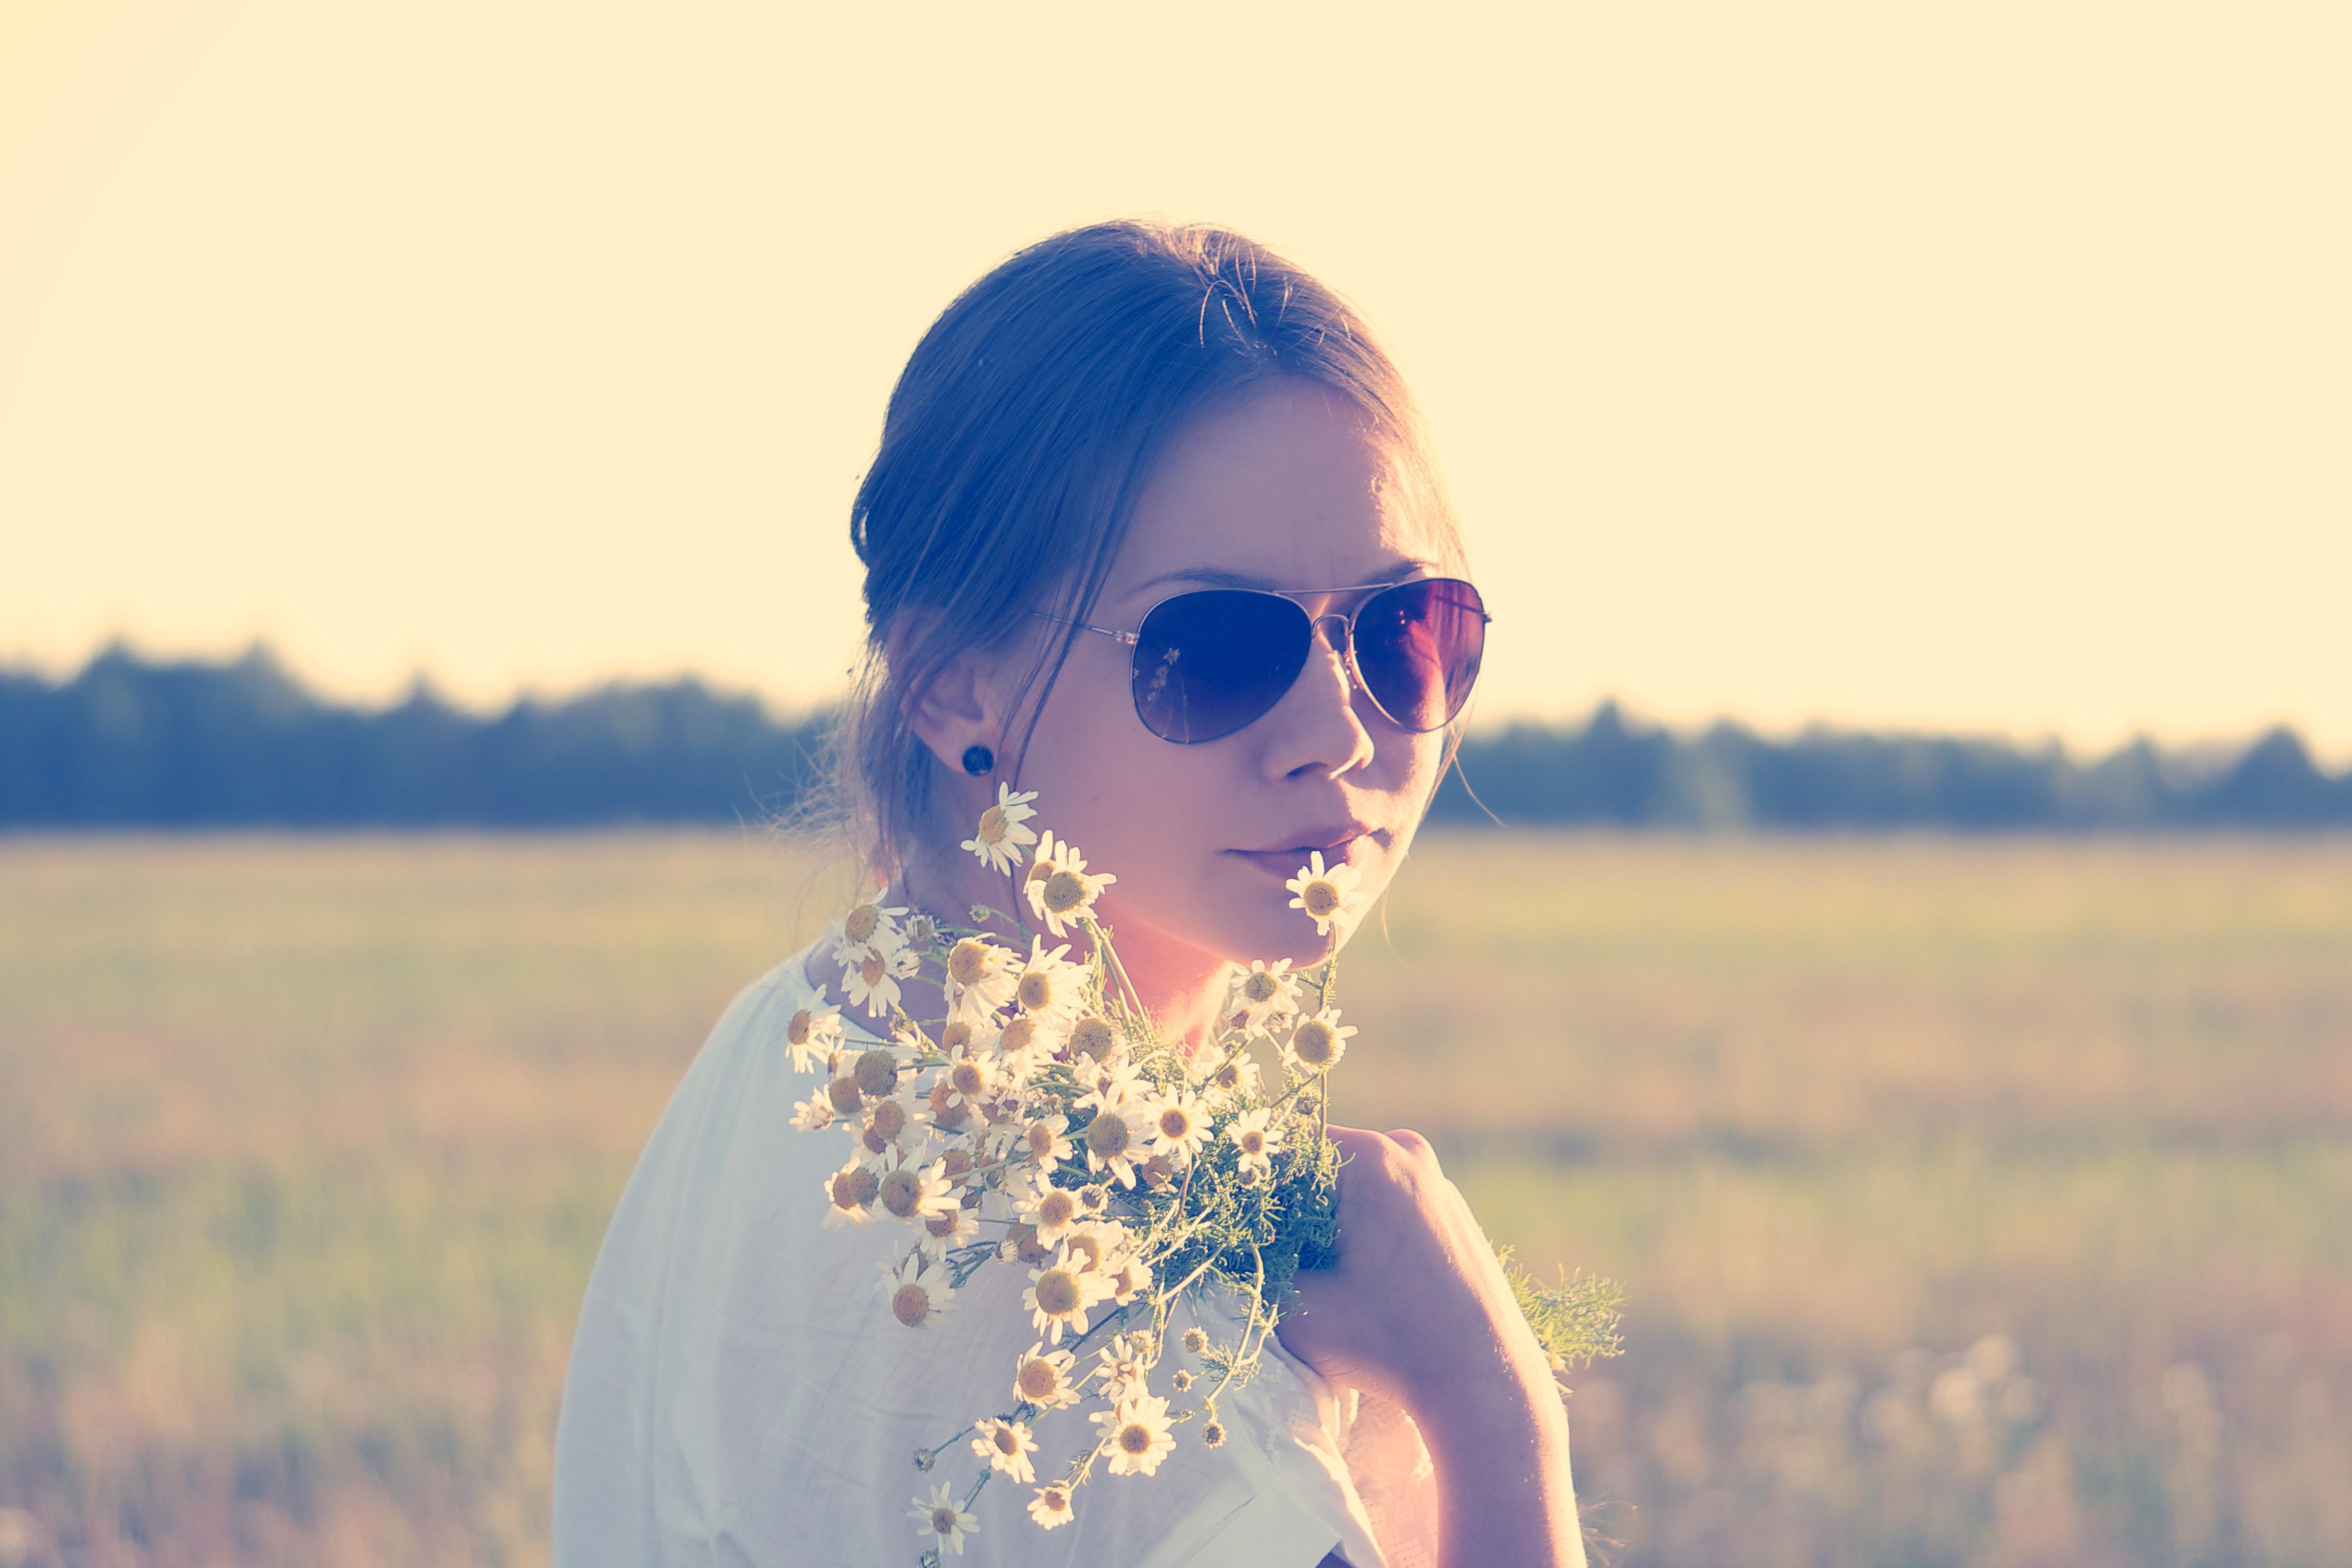 Free Images Girl Woman Hair Sunlight Flower Summer Daisy